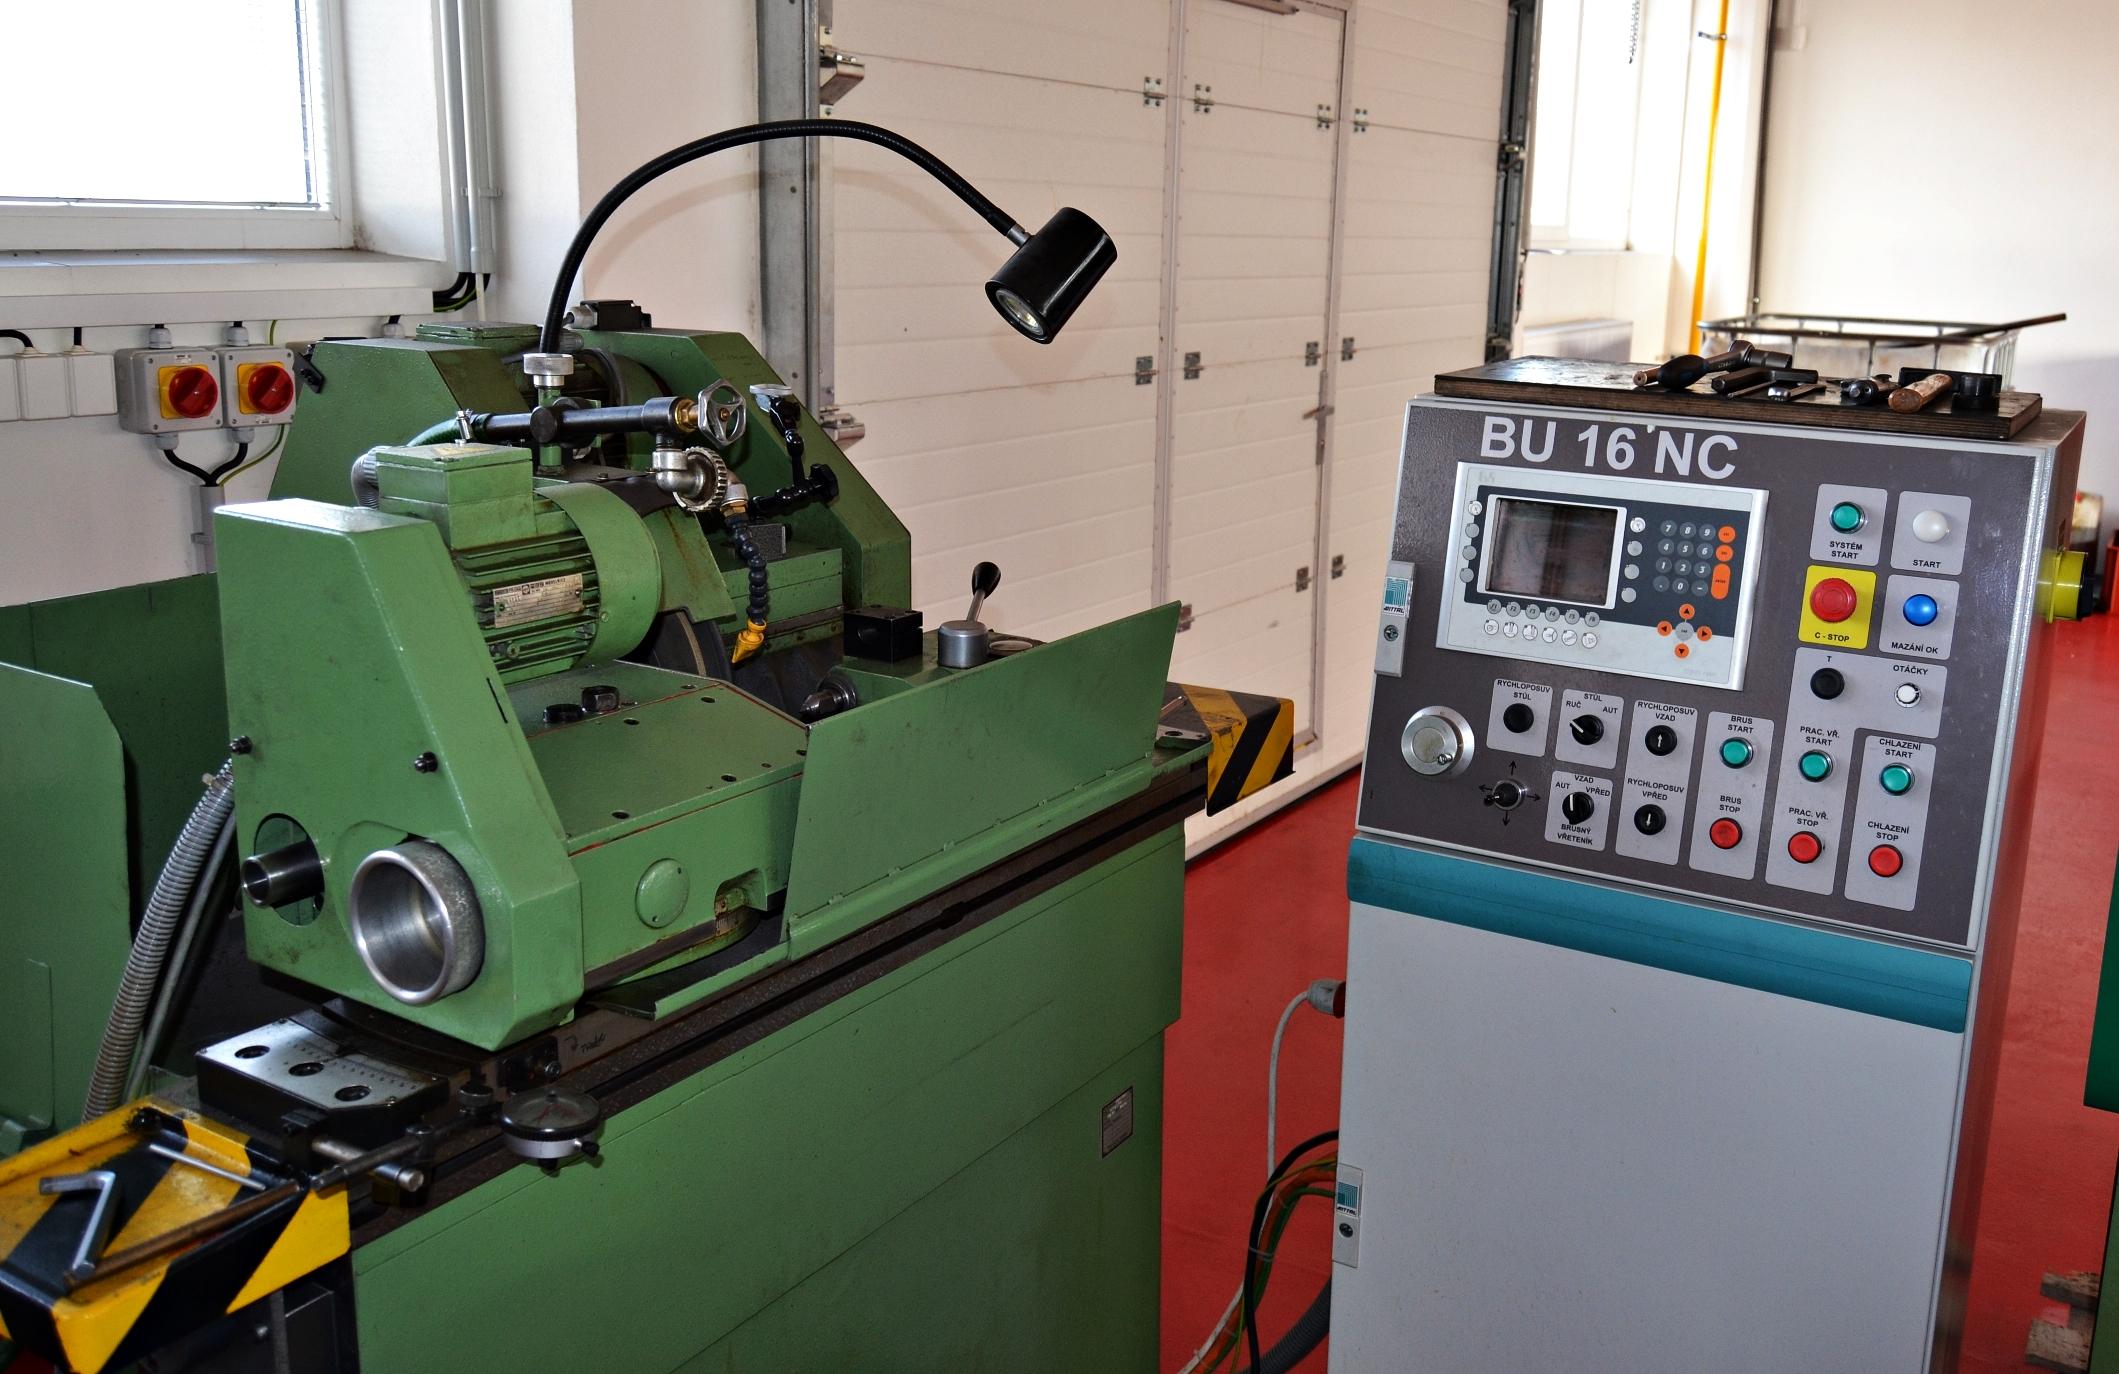 Broušení - bruska na kulato BU 16 NCbruska na kulato BK400 konvenčníbruska na plocho BPH 20NA (200x600mm) 2xbruska na plocho MATRA (400x800mm)